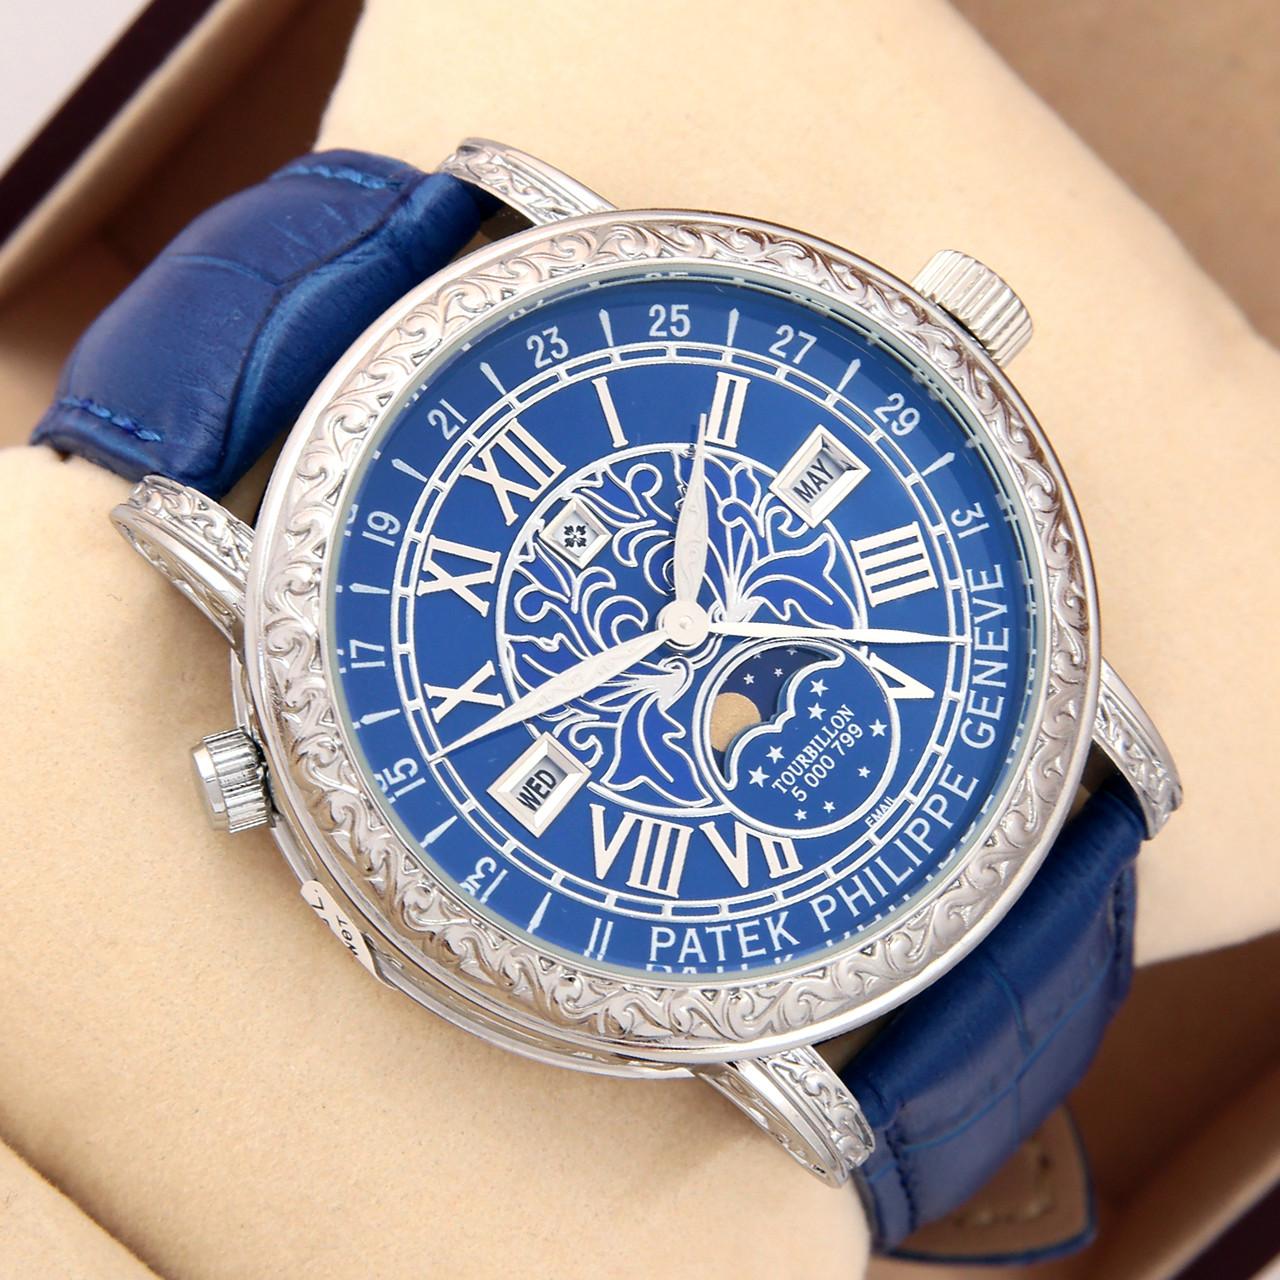 16b7d1c9 Астрономические часы Patek Philippe Grand Complications 6002 Sky Moon  Tourbillon - цвет платина в синем